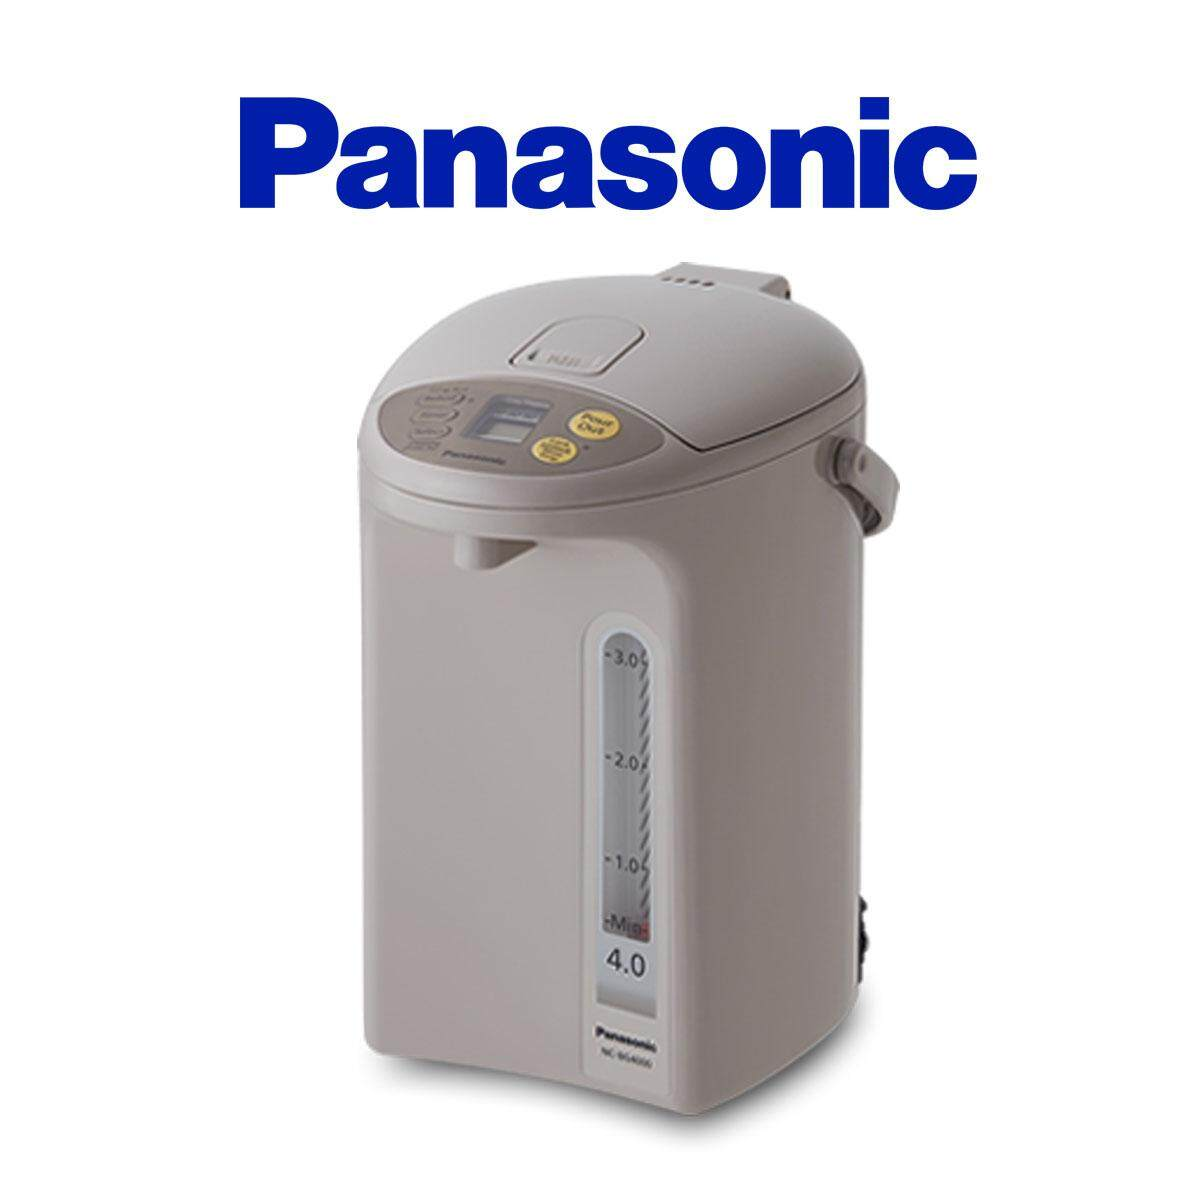 PANASONIC 4.0L THERMO POT NC-BG4000 (U-VIP)